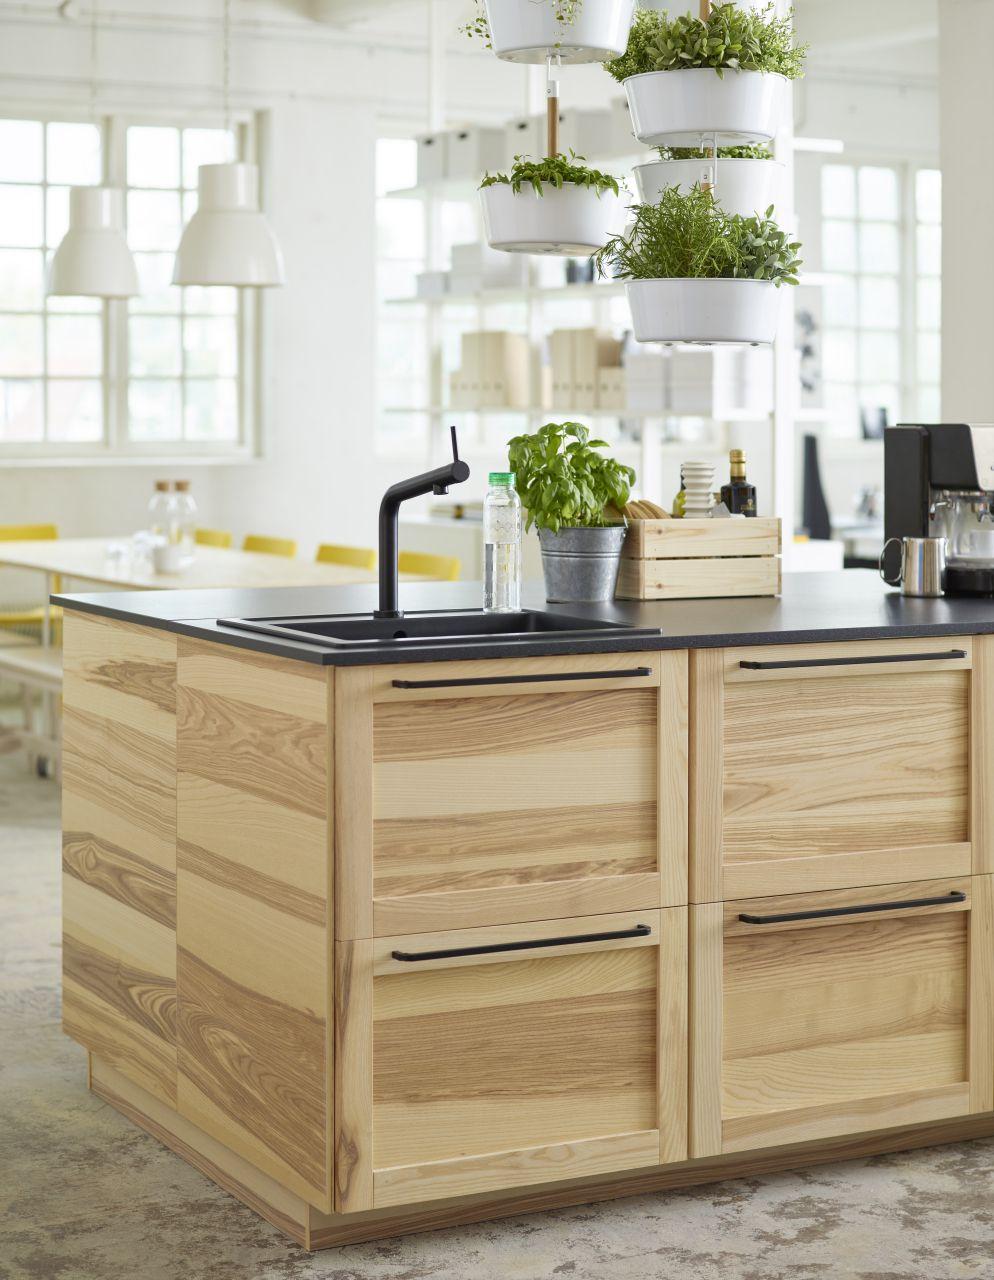 Pin by IKEA Baltics on Kitchen Ideas Kitchen faucet